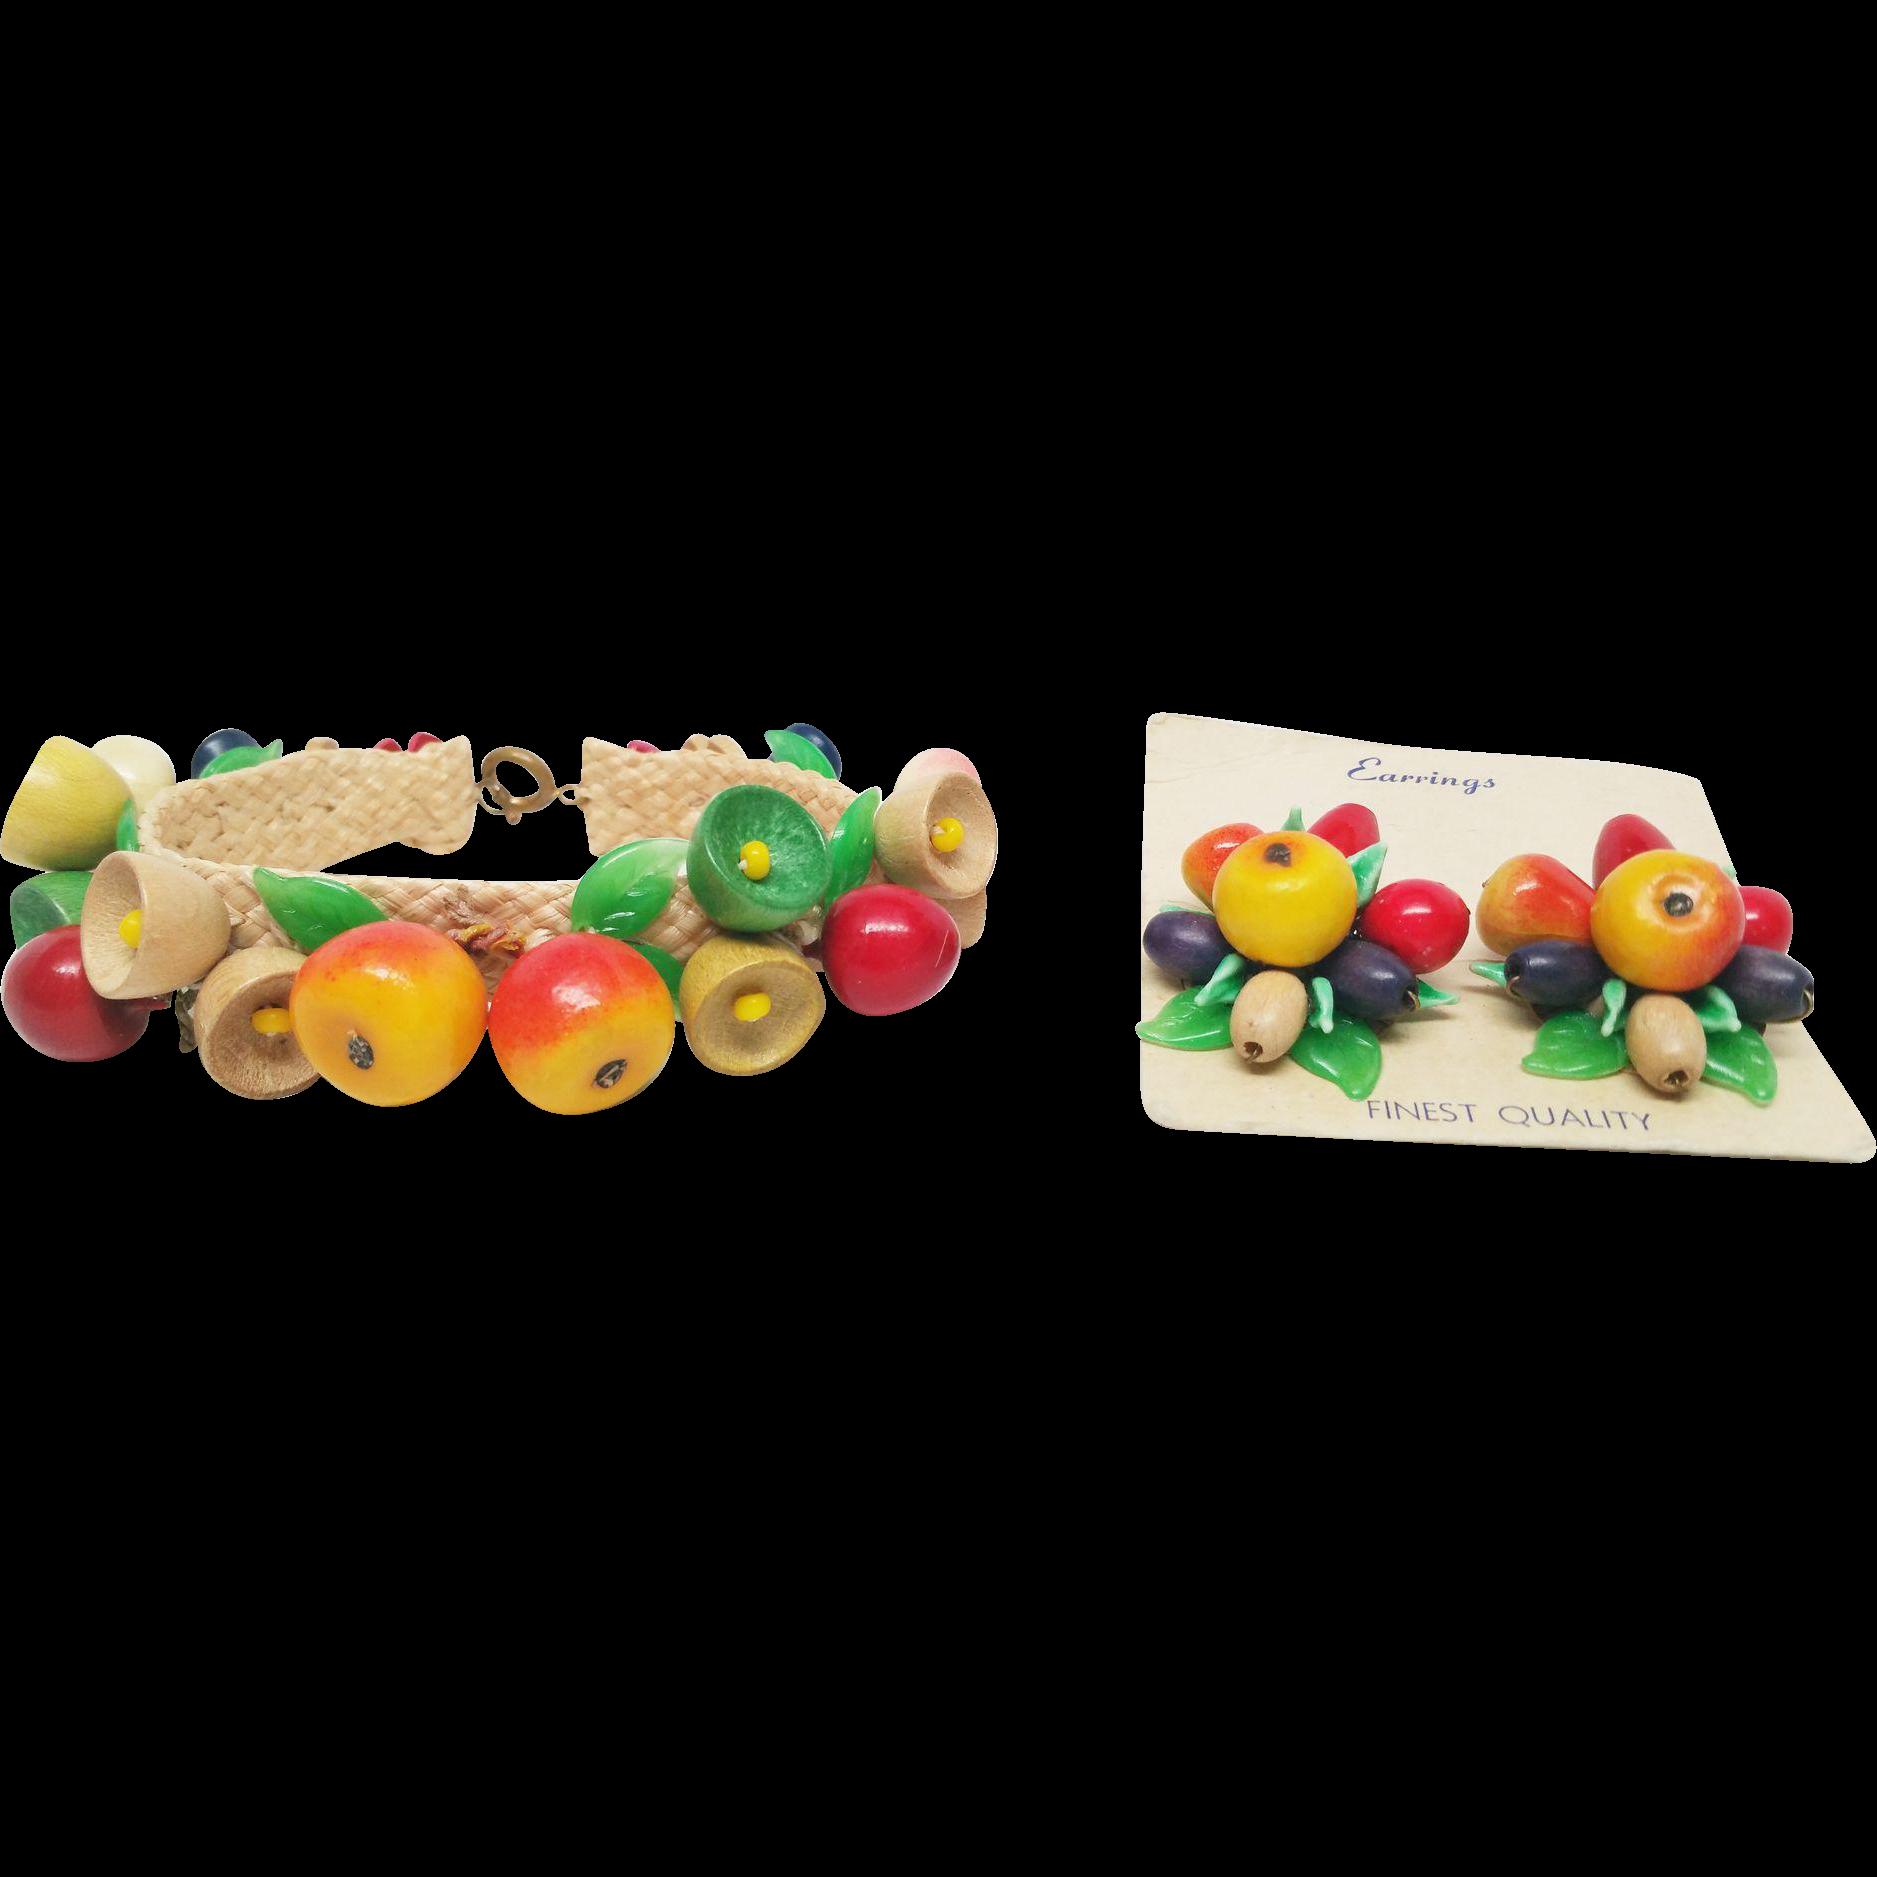 Czechoslovakia wood and glass Fruit Carmen Miranda Bracelet earrings and necklace  Set